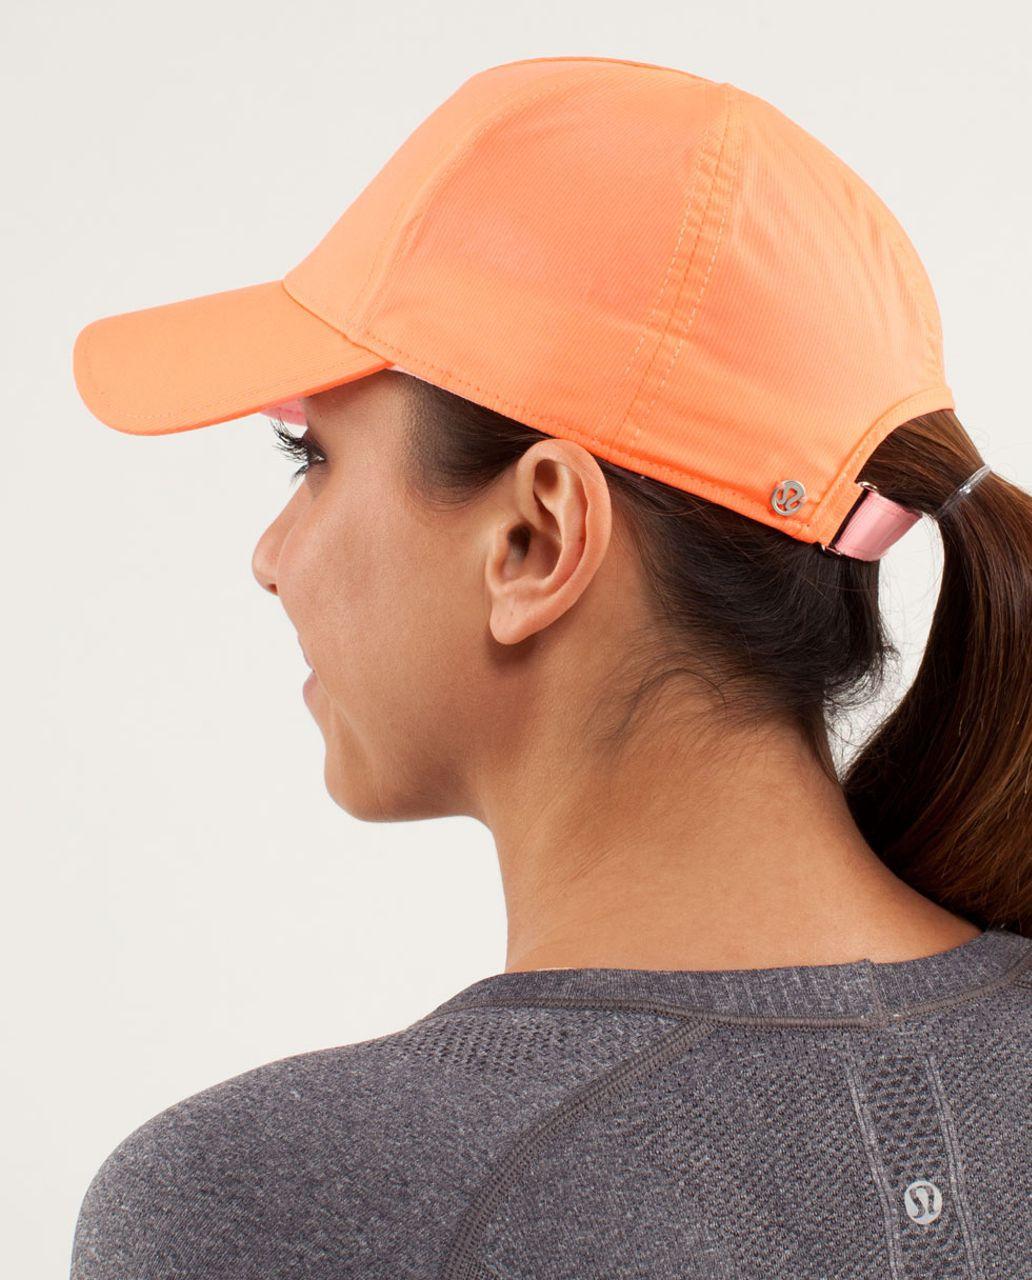 Lululemon Classy Cap - Pop Orange